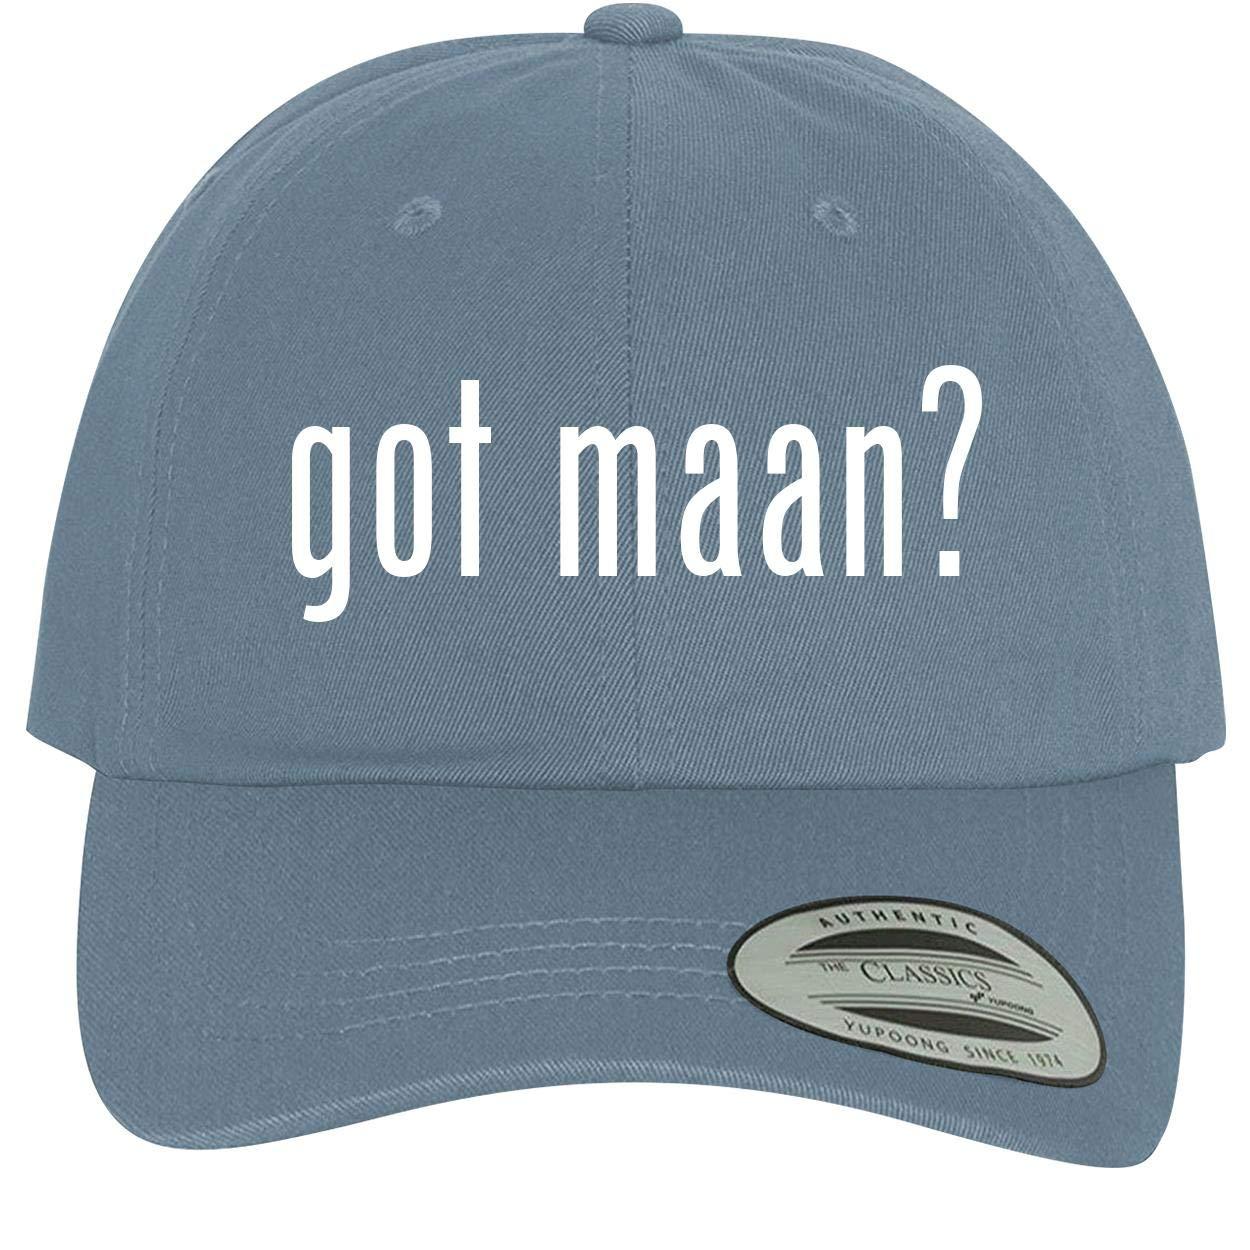 got maan? - Comfortable Dad Hat Baseball Cap, Light Blue by BH Cool Designs